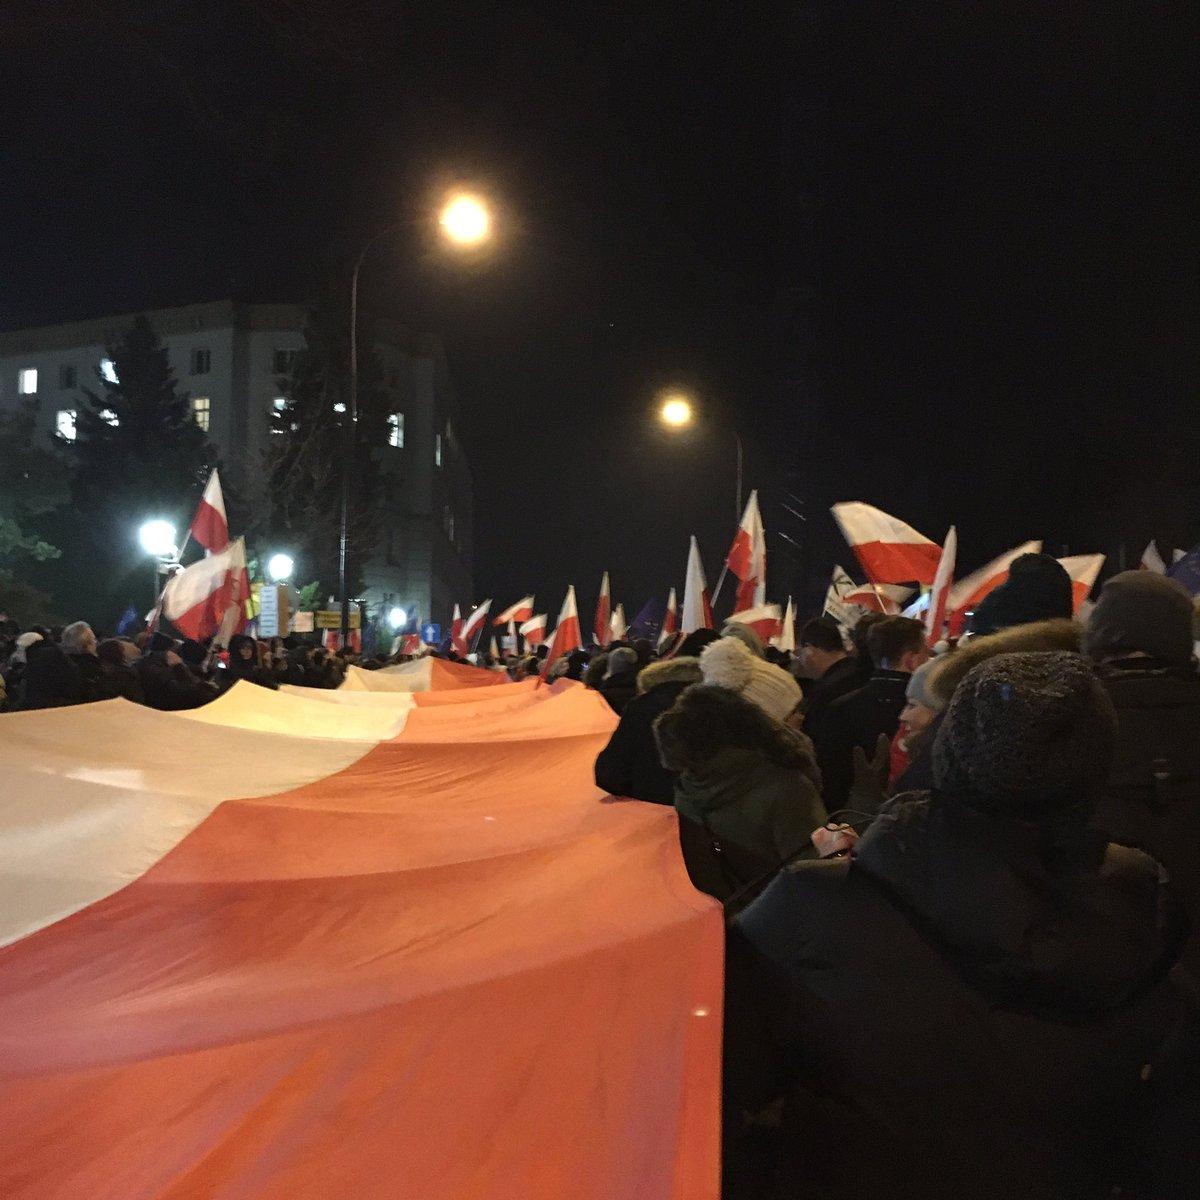 Huge Polish flag and crowds asking for freedom of press and true democracy #WolneMediawSejmie #sejm #warsaw https://t.co/t1qeLvsug1